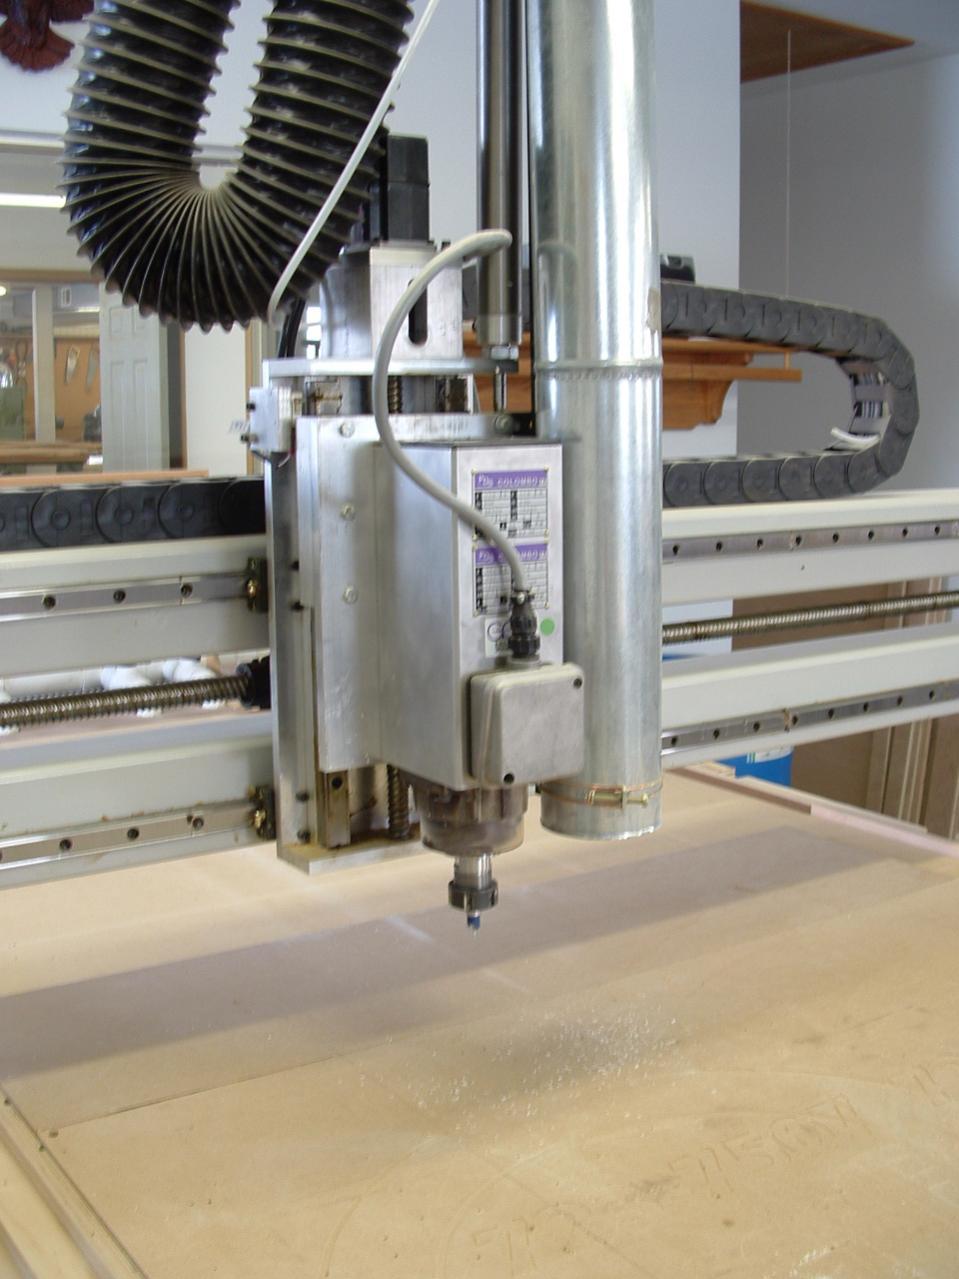 CNC vs. Panel Saw for one man shop-dscf0160.jpg